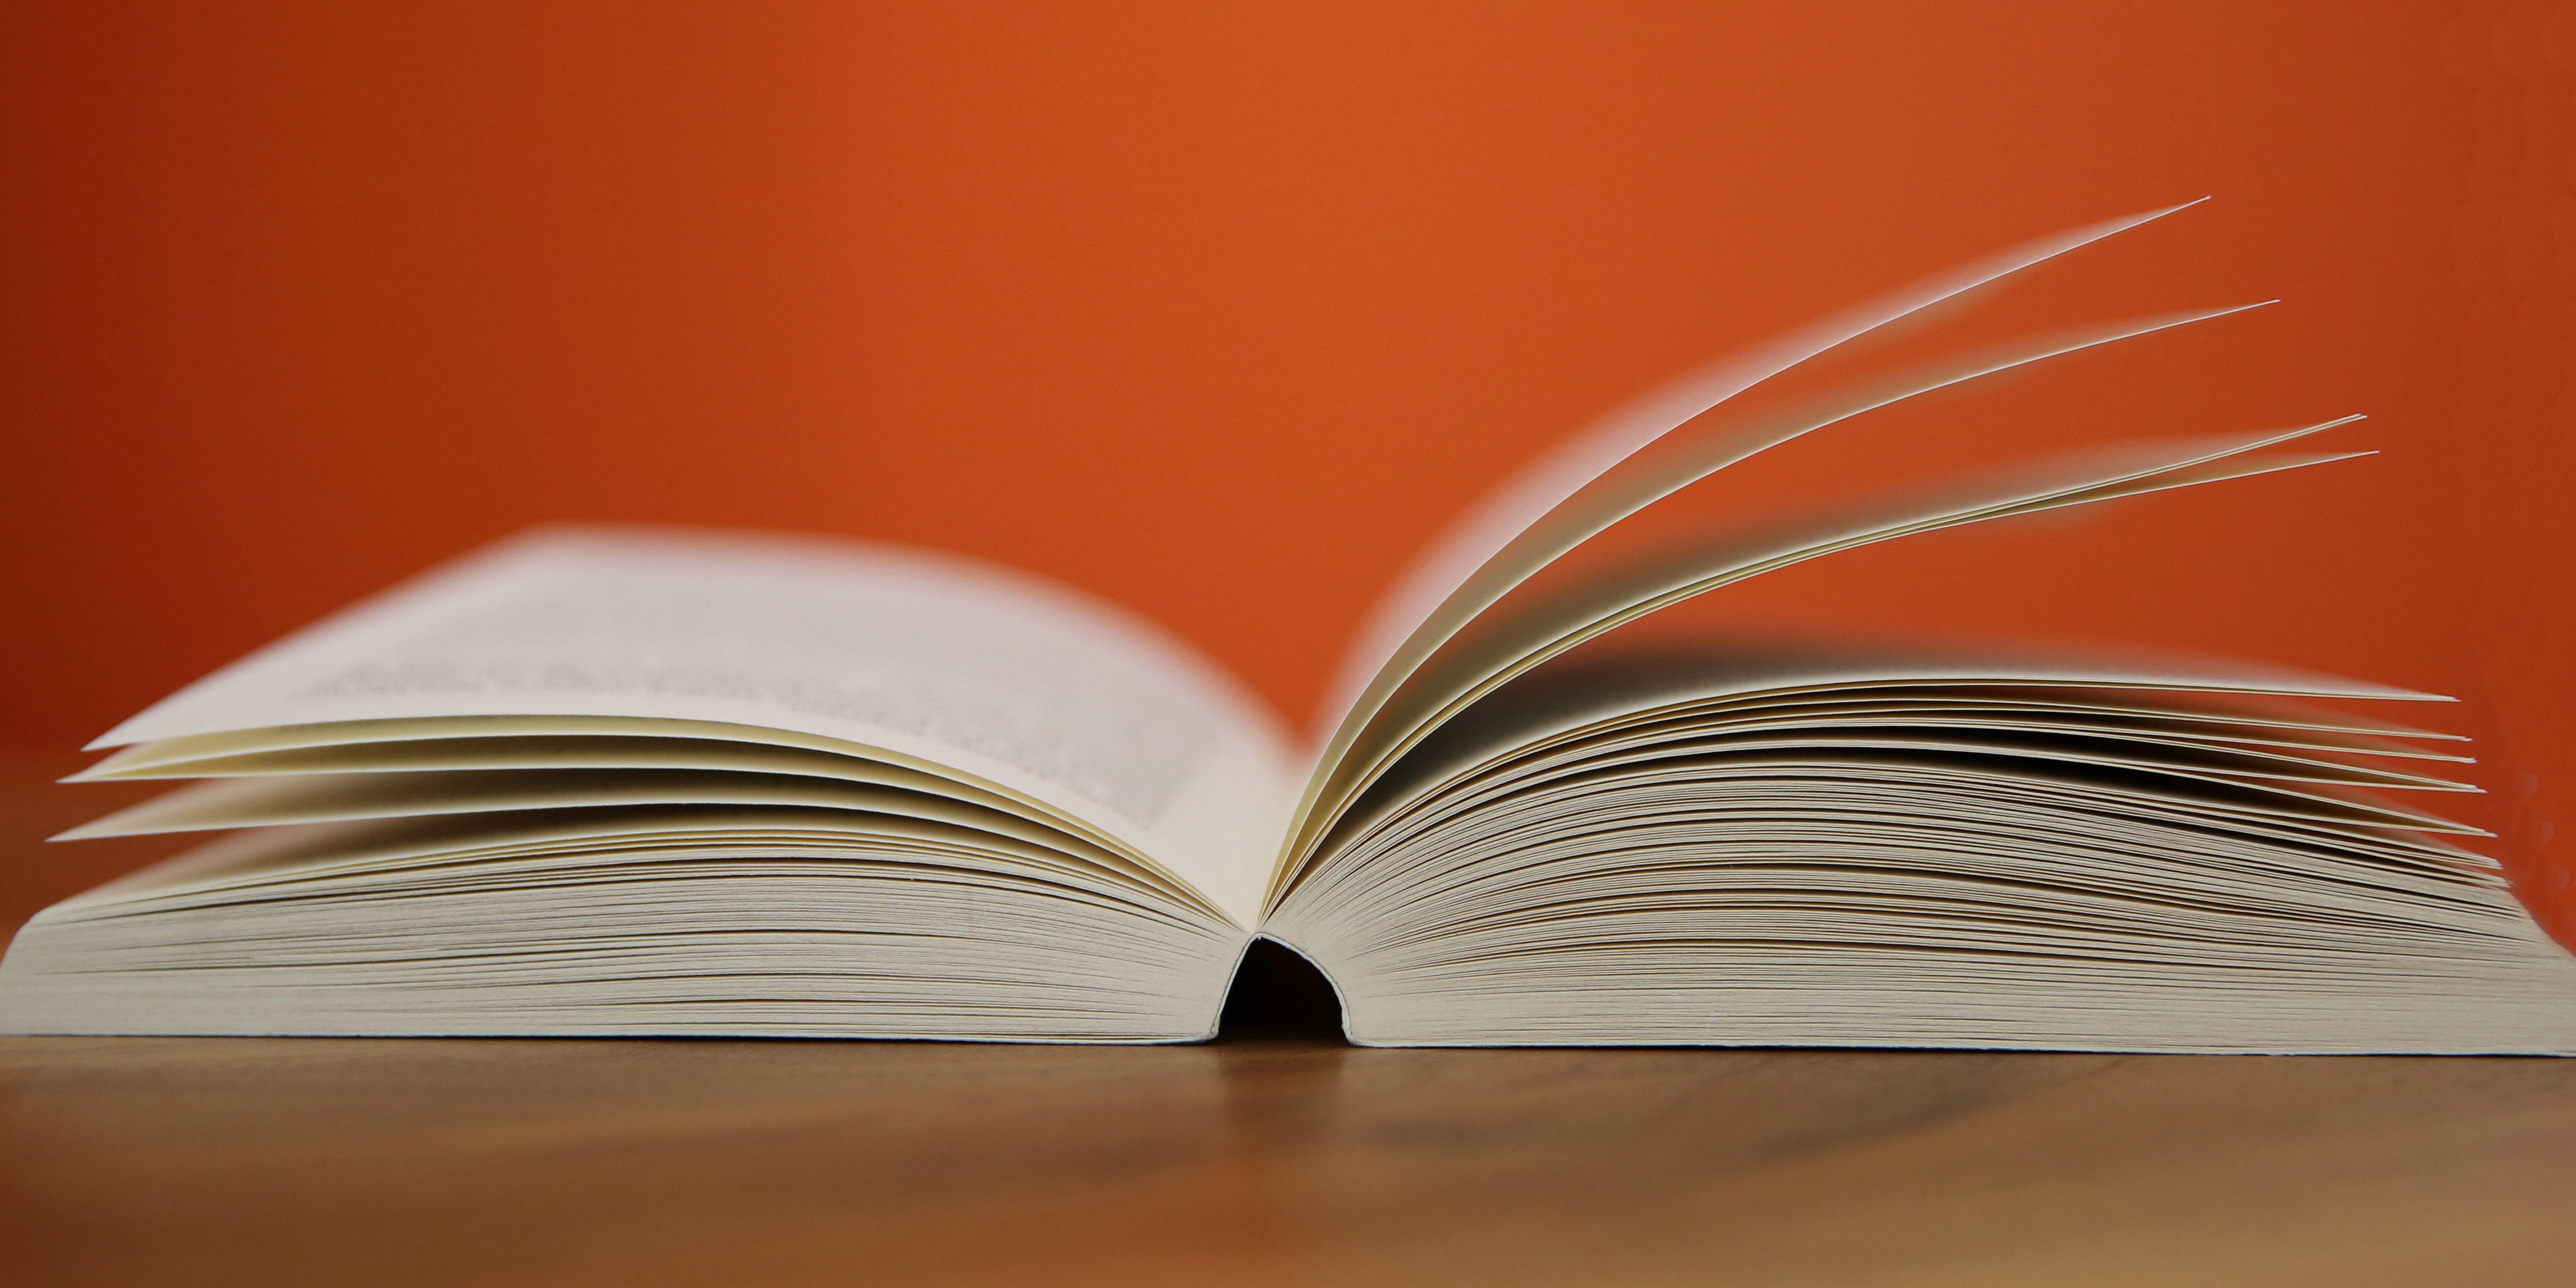 Rekomendasi Buku Wajib Untuk Investor Pemula